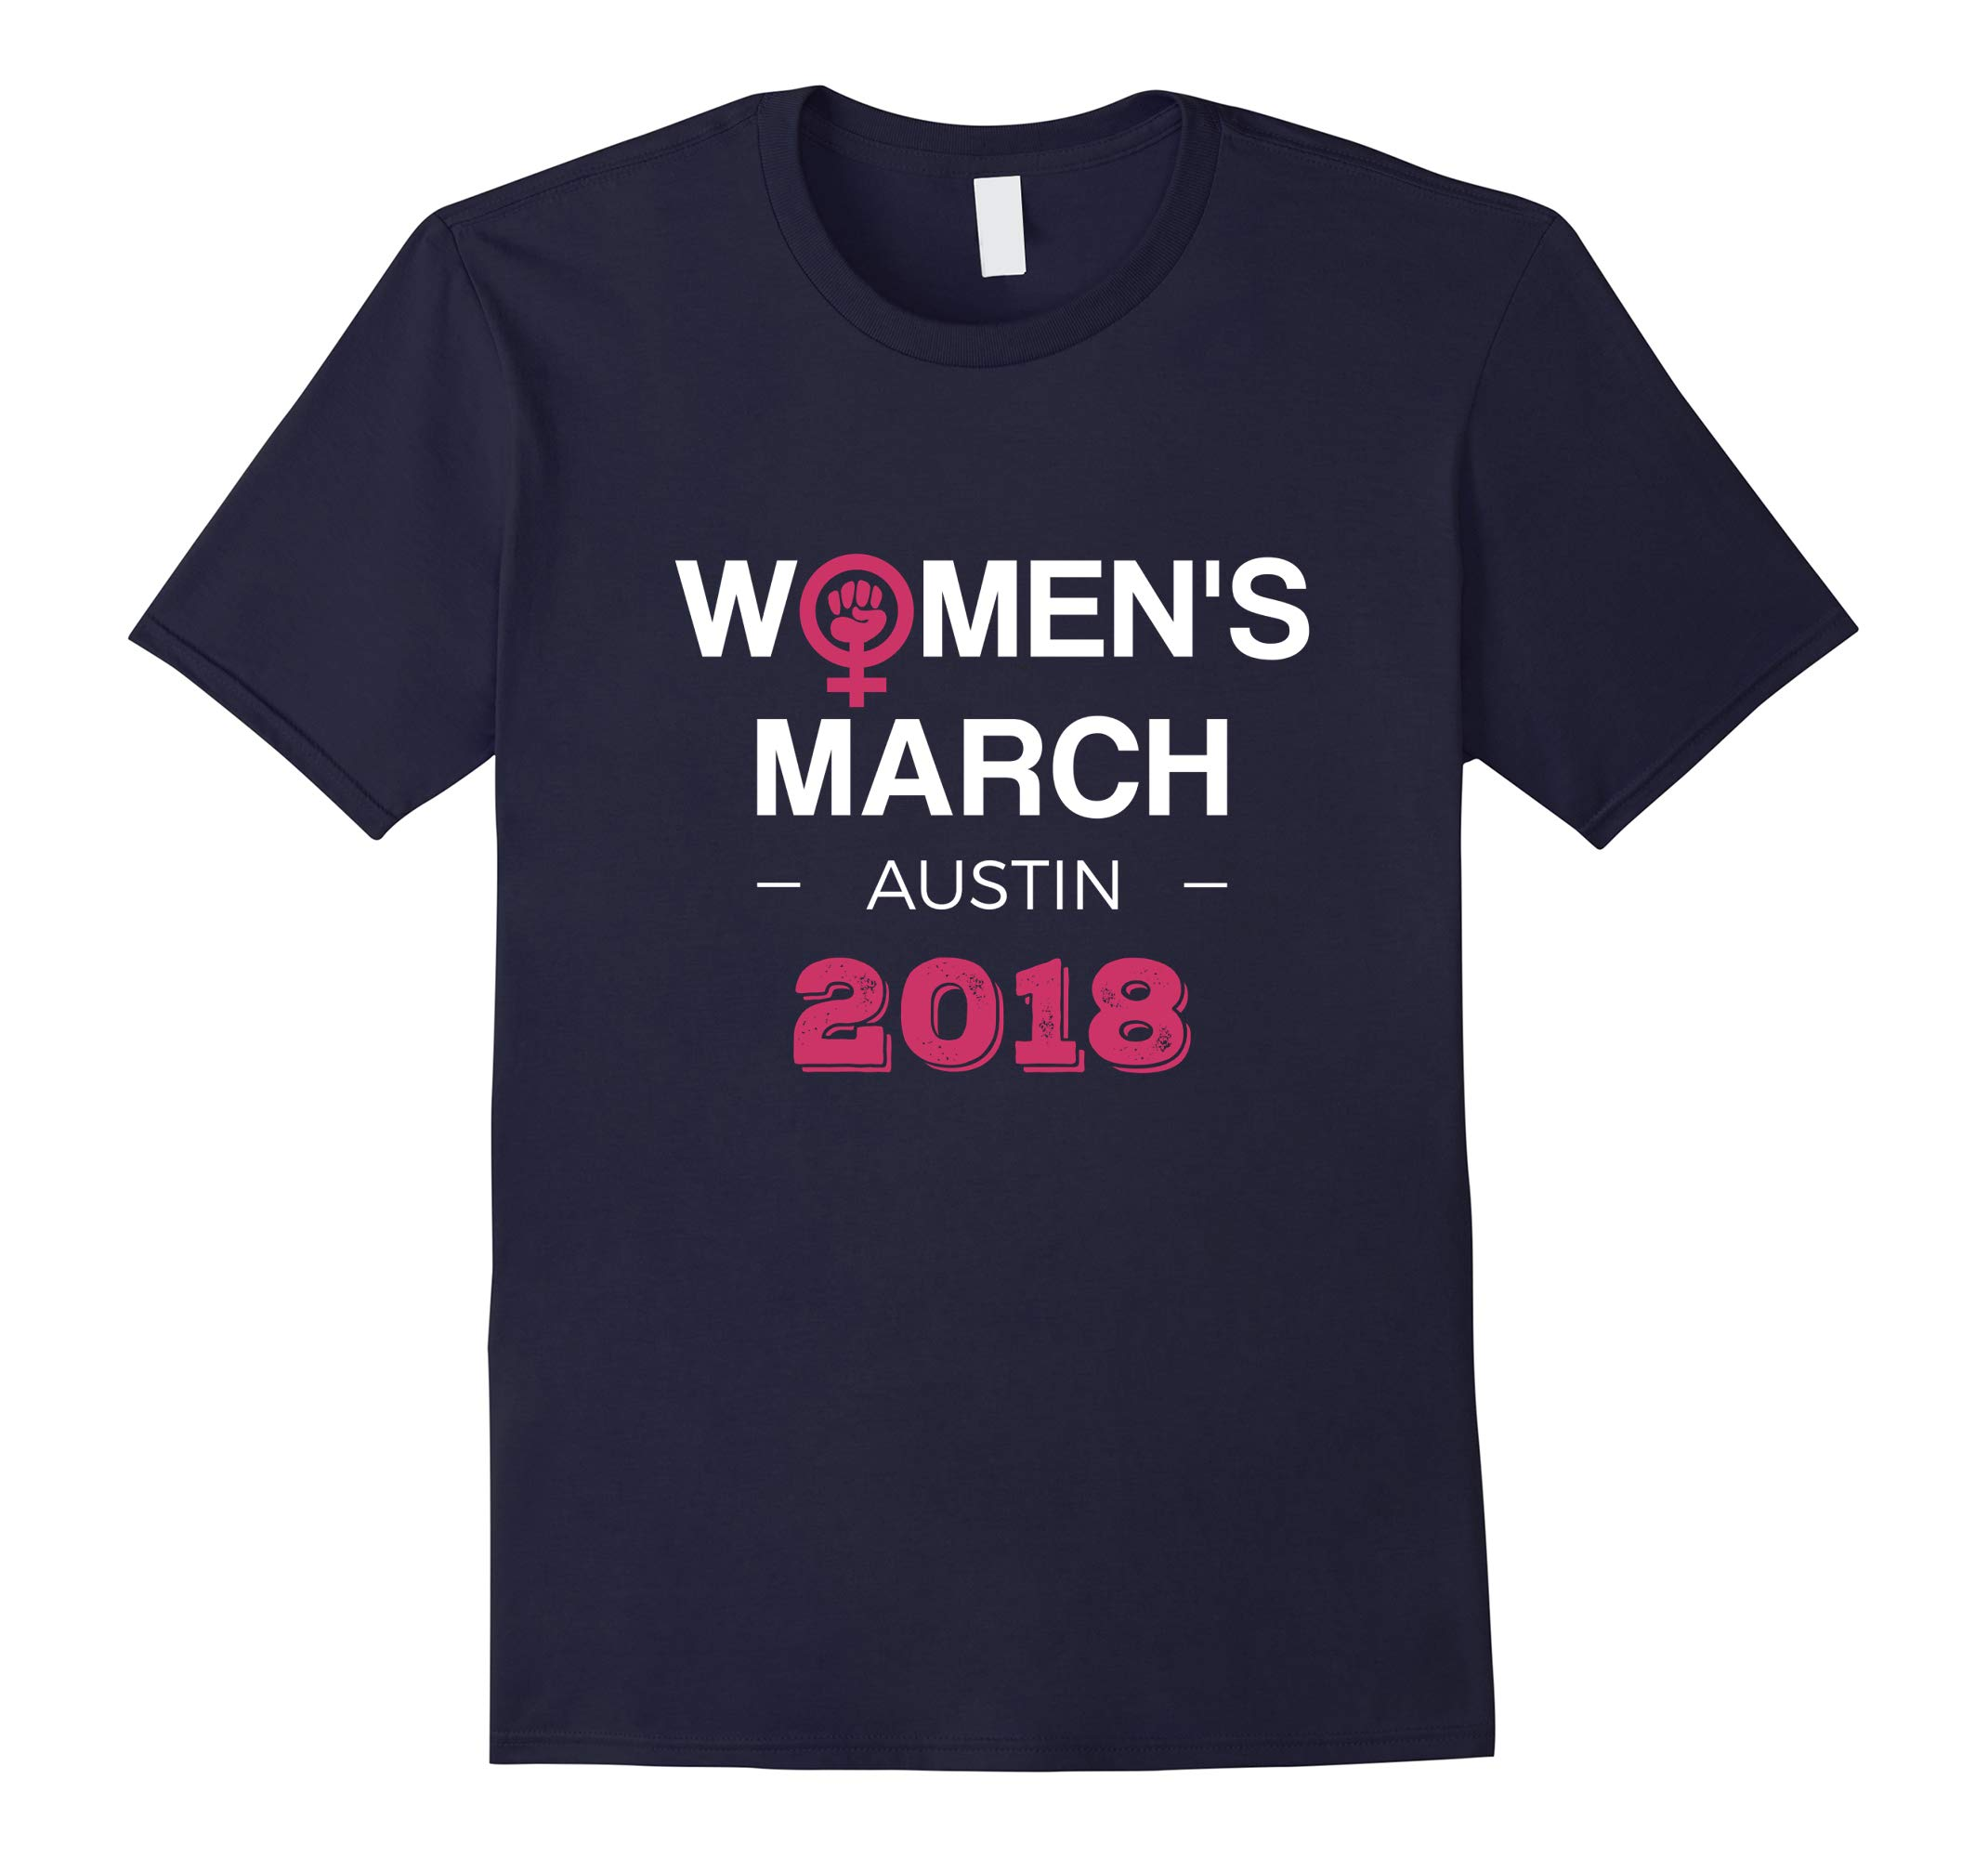 Austin Women's March 2018 T-shirt Feminism Symbol Design-RT